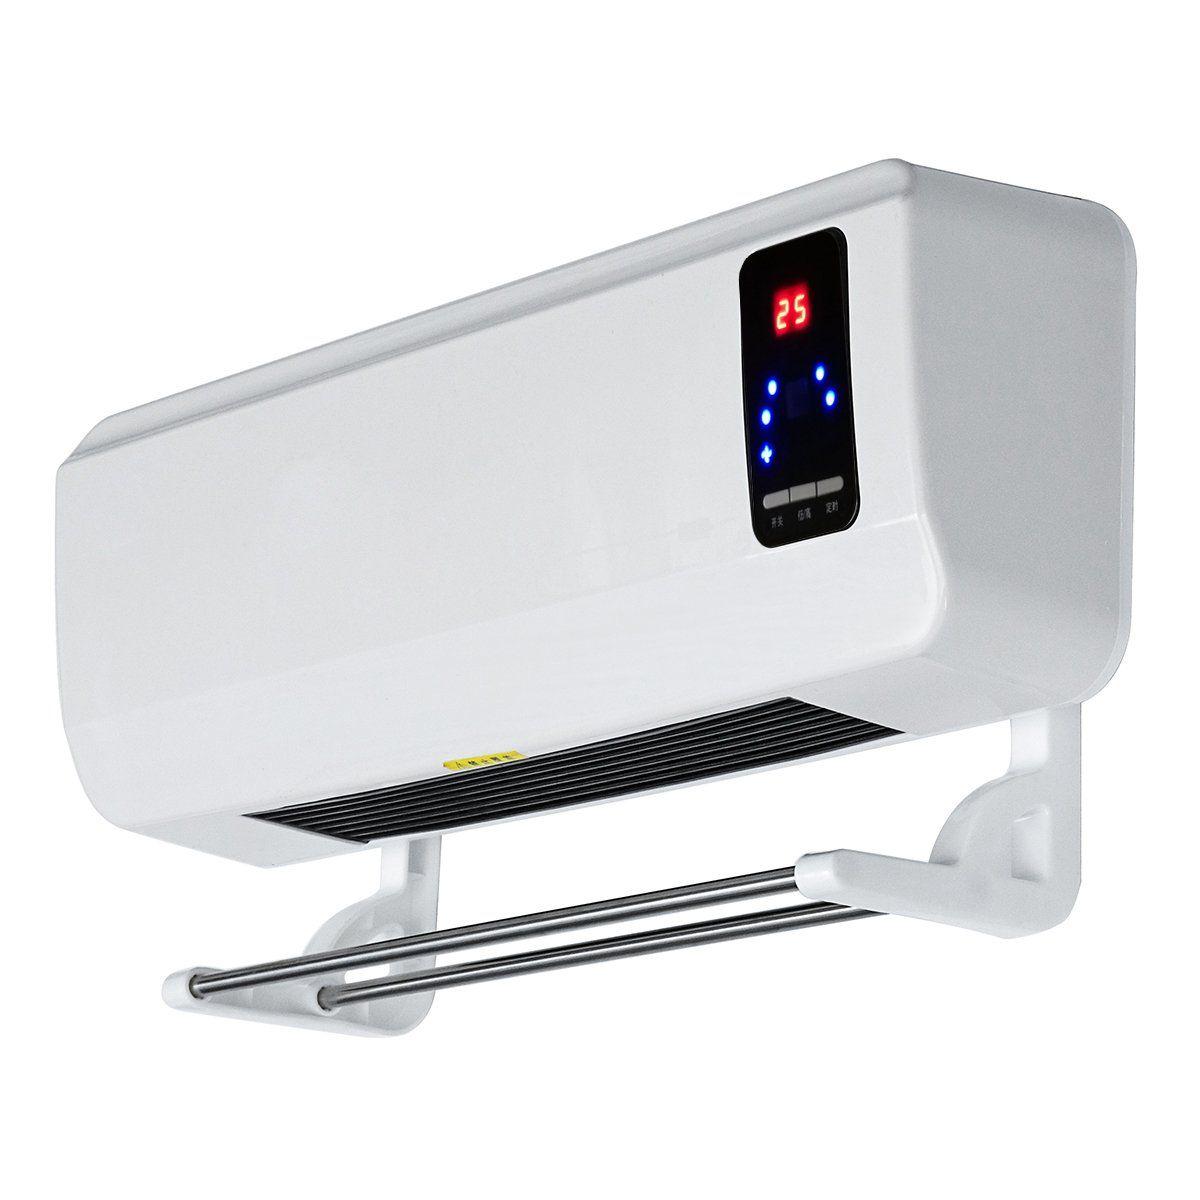 220v 2000w Wall Mounted Heater Timing Space Heating Ptc Air Conditioner Dehumidifier Kondicioner Displej Indoneziya